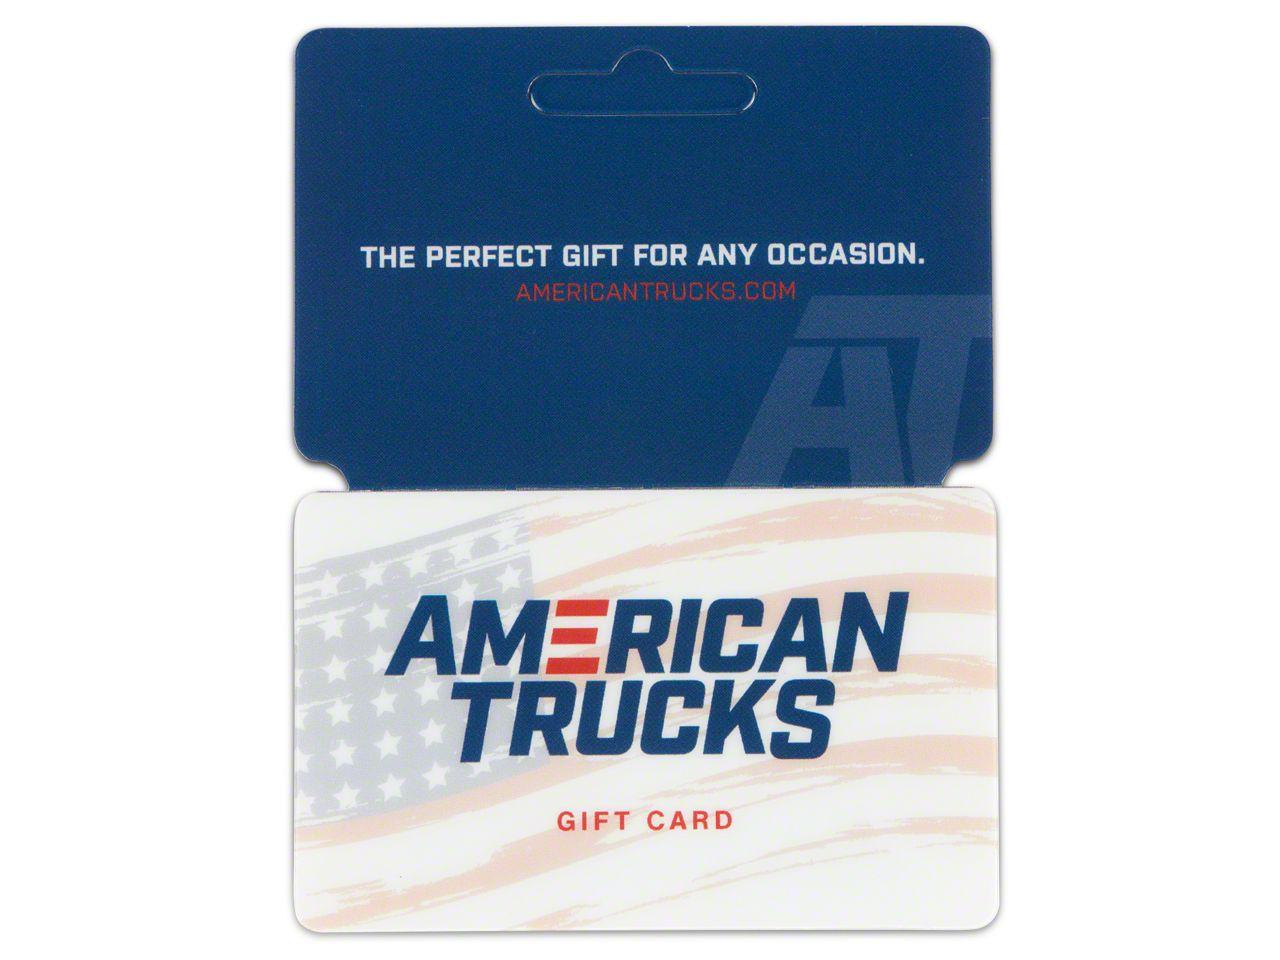 AmericanTrucks Gift Card (E-mailed)